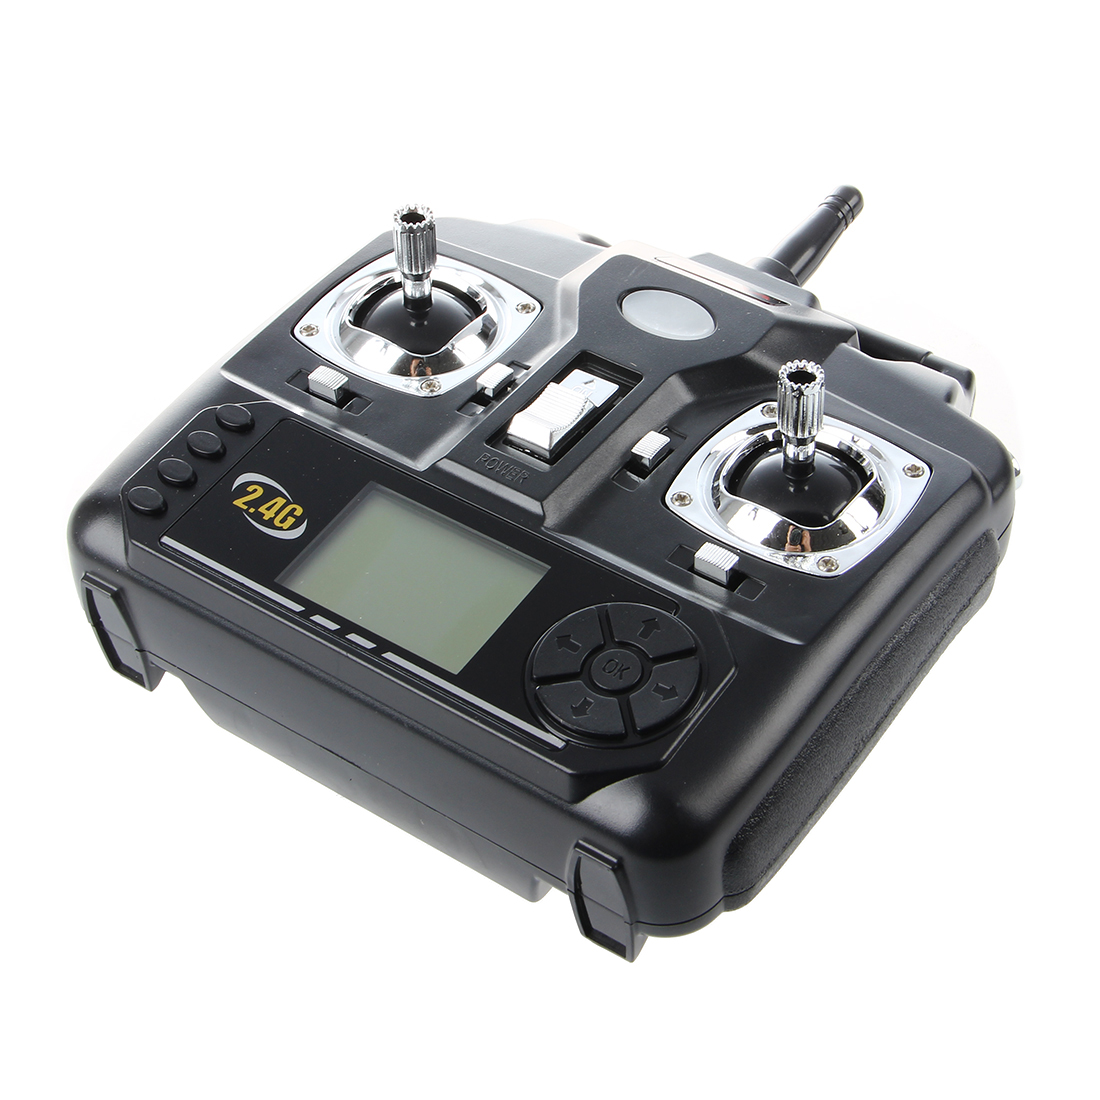 Syma Transmitter Remote Control for SYMA X5 and X5C Quadcopter Drone Remote Control, Black